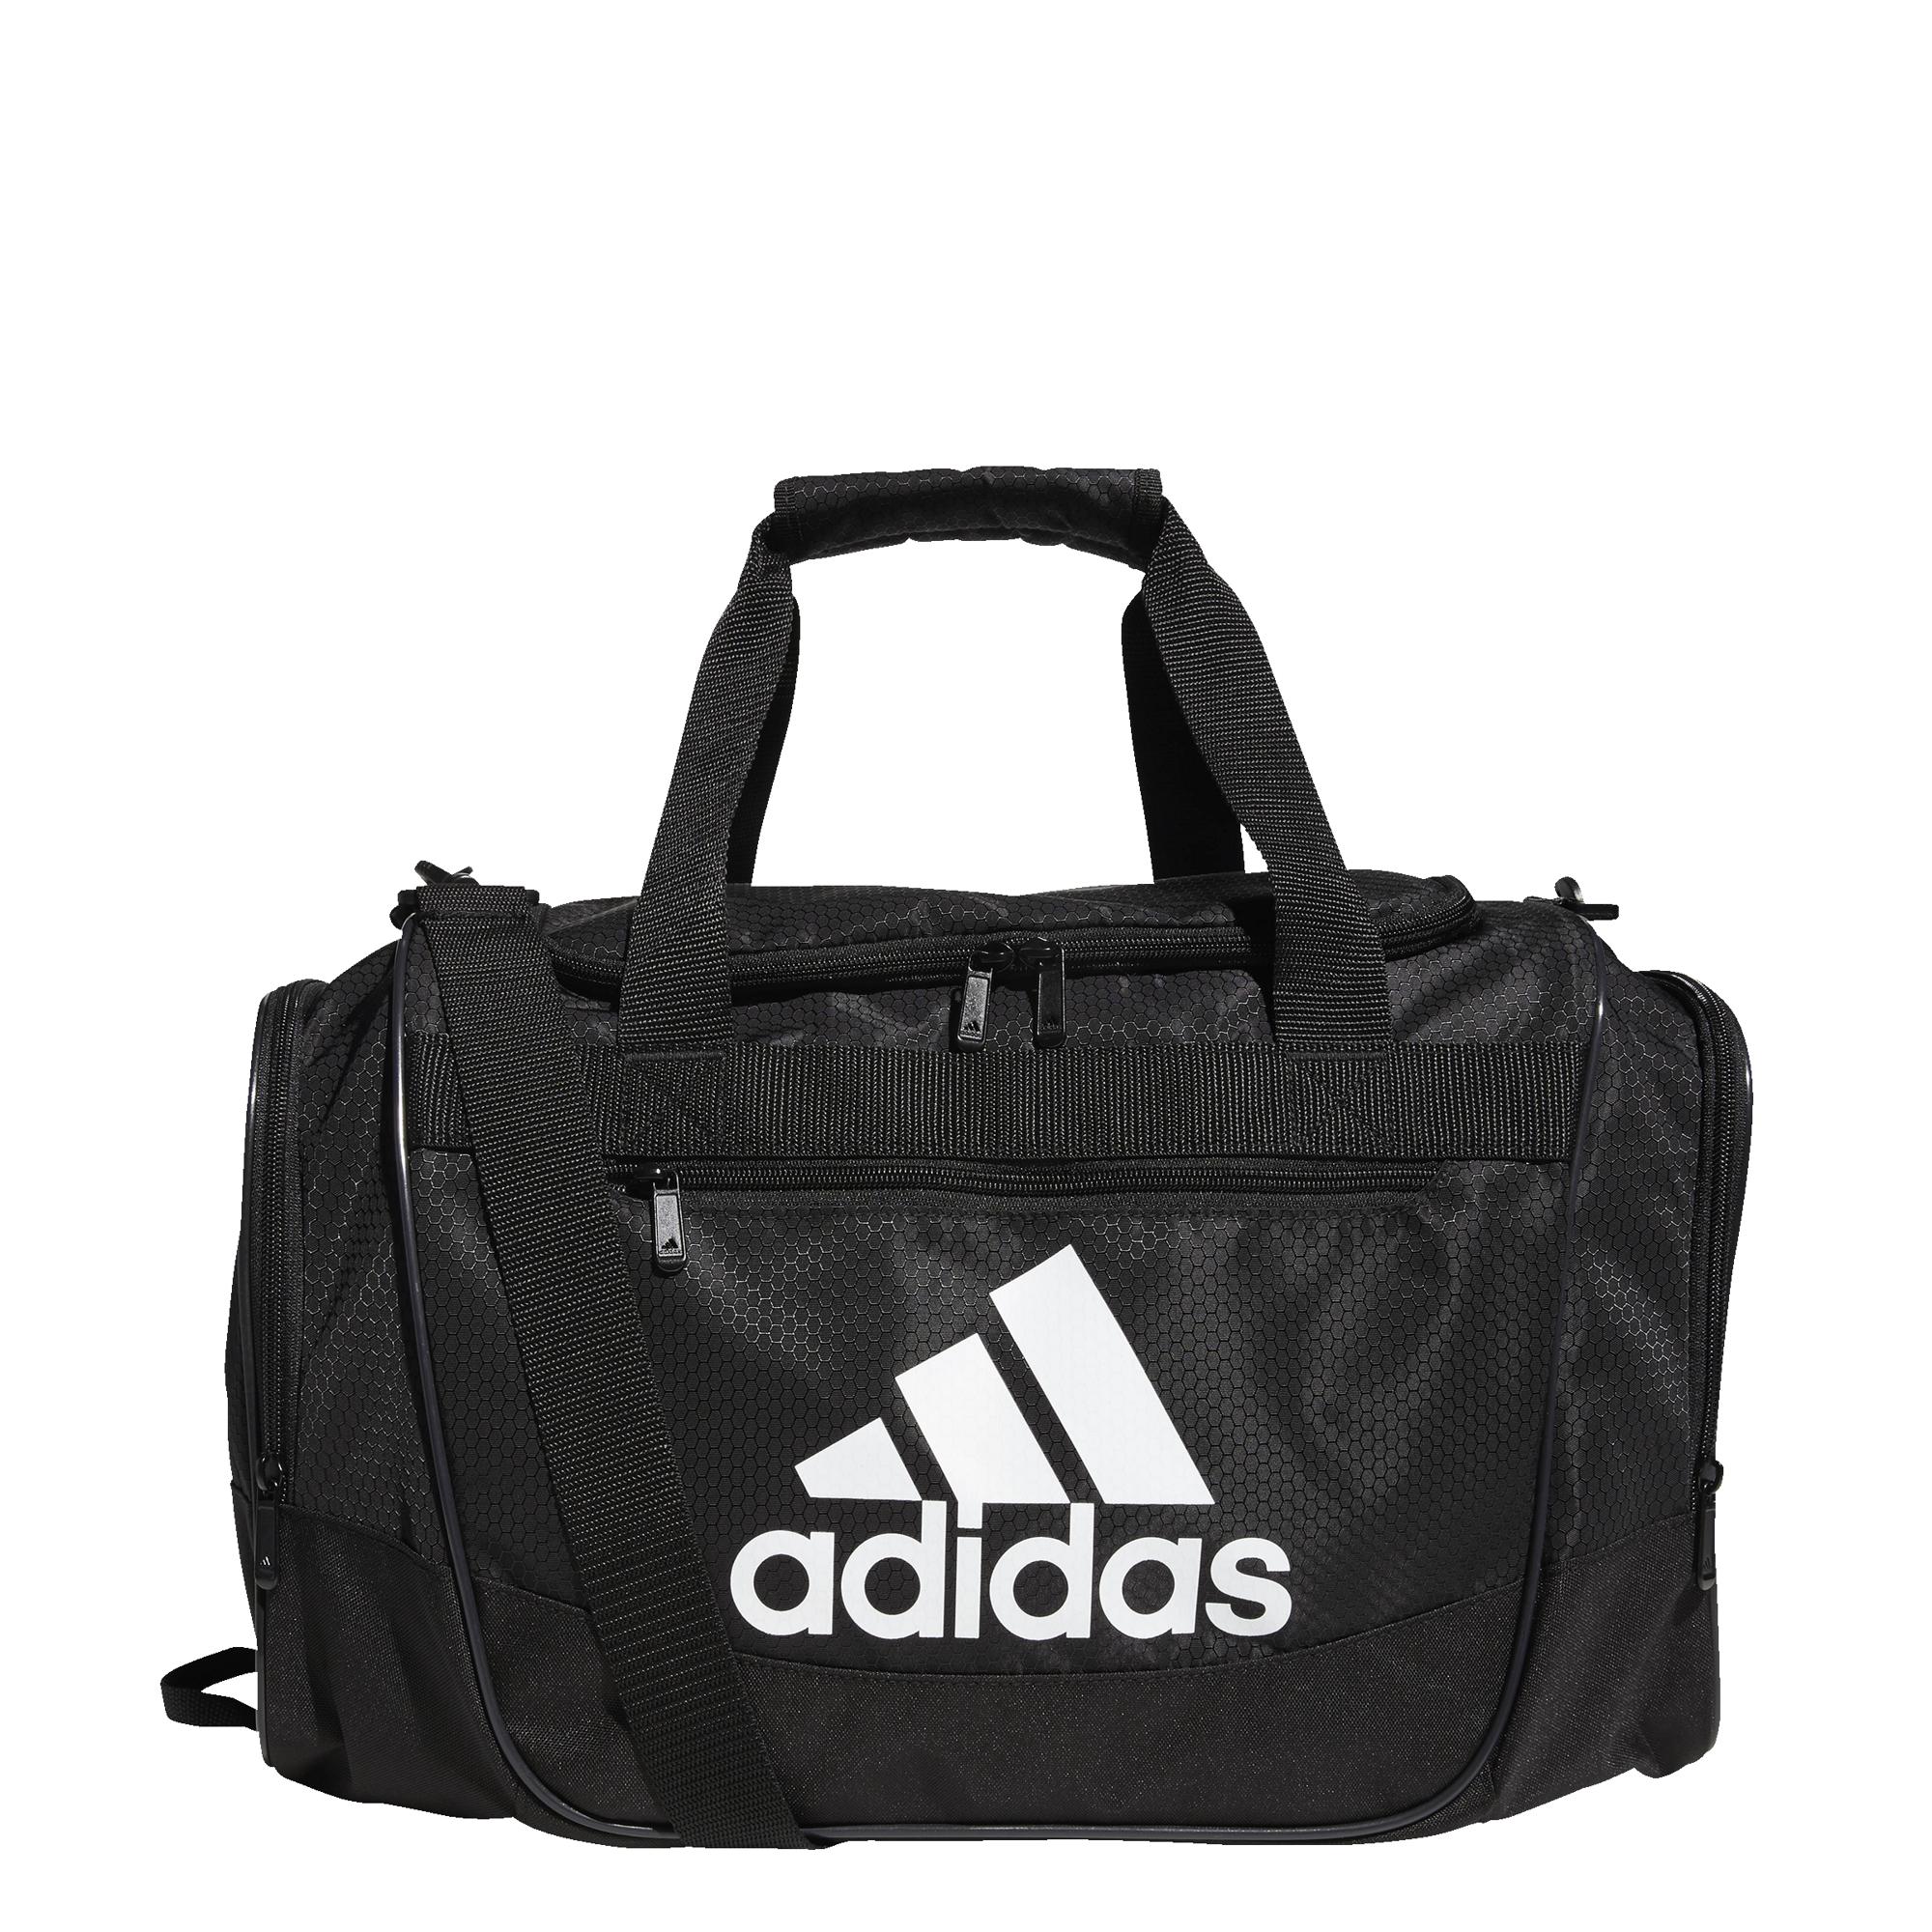 miniature 10 - adidas Defender III Small Duffel  Bags